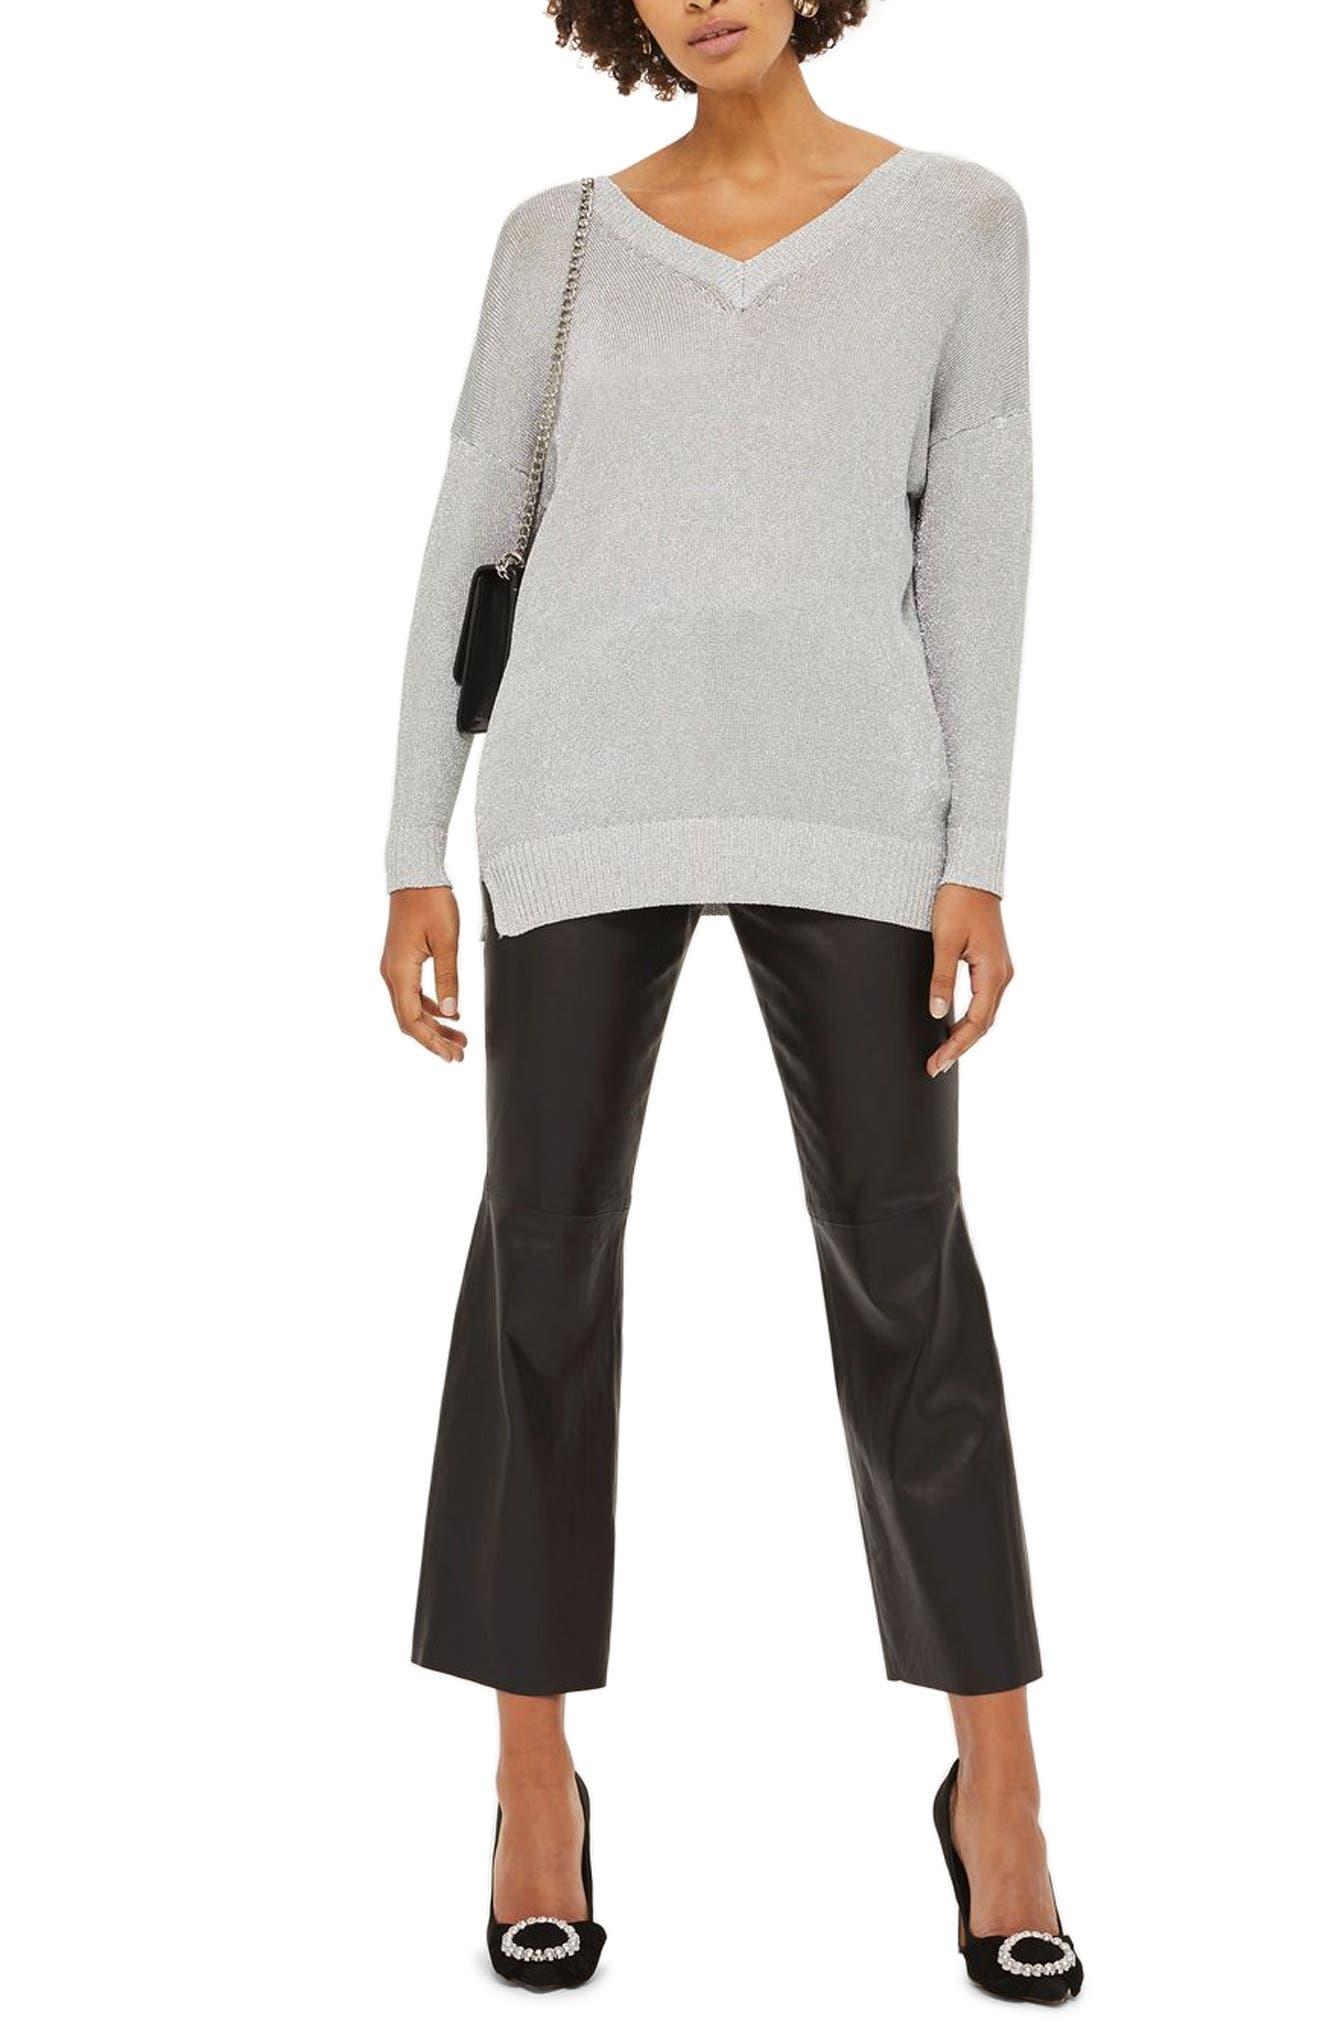 Main Image - Topshop Metallic Longline V-Neck Sweater